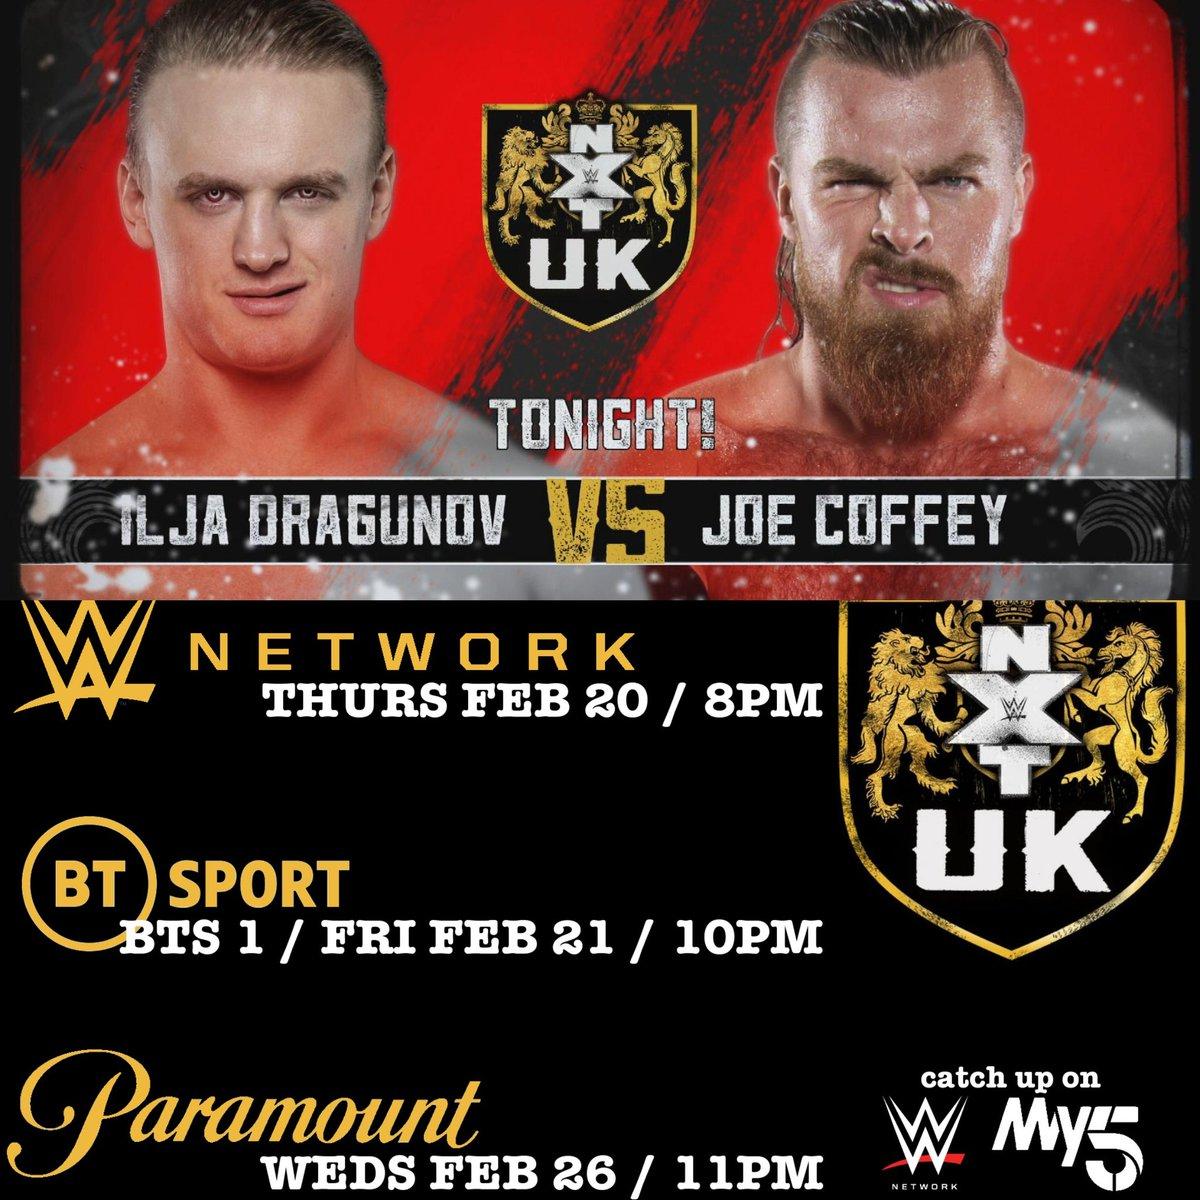 TONIGHT on @NXTUK‼✅@Tyler_Bate vs @JosephConners✅@JinnyCouture crashes the show!✅@NoamDar in action!✅ Main Event: @UNBESIEGBAR_ZAR vs @Joe_CoffeyTONIGHT 8PM (3PM US EST) @WWENetworkFRI 10PM - @btsport 1WEDS 11PM - @Channel5Sport#WWE #NXTUK #WeAreNXTUK #WWEonBT